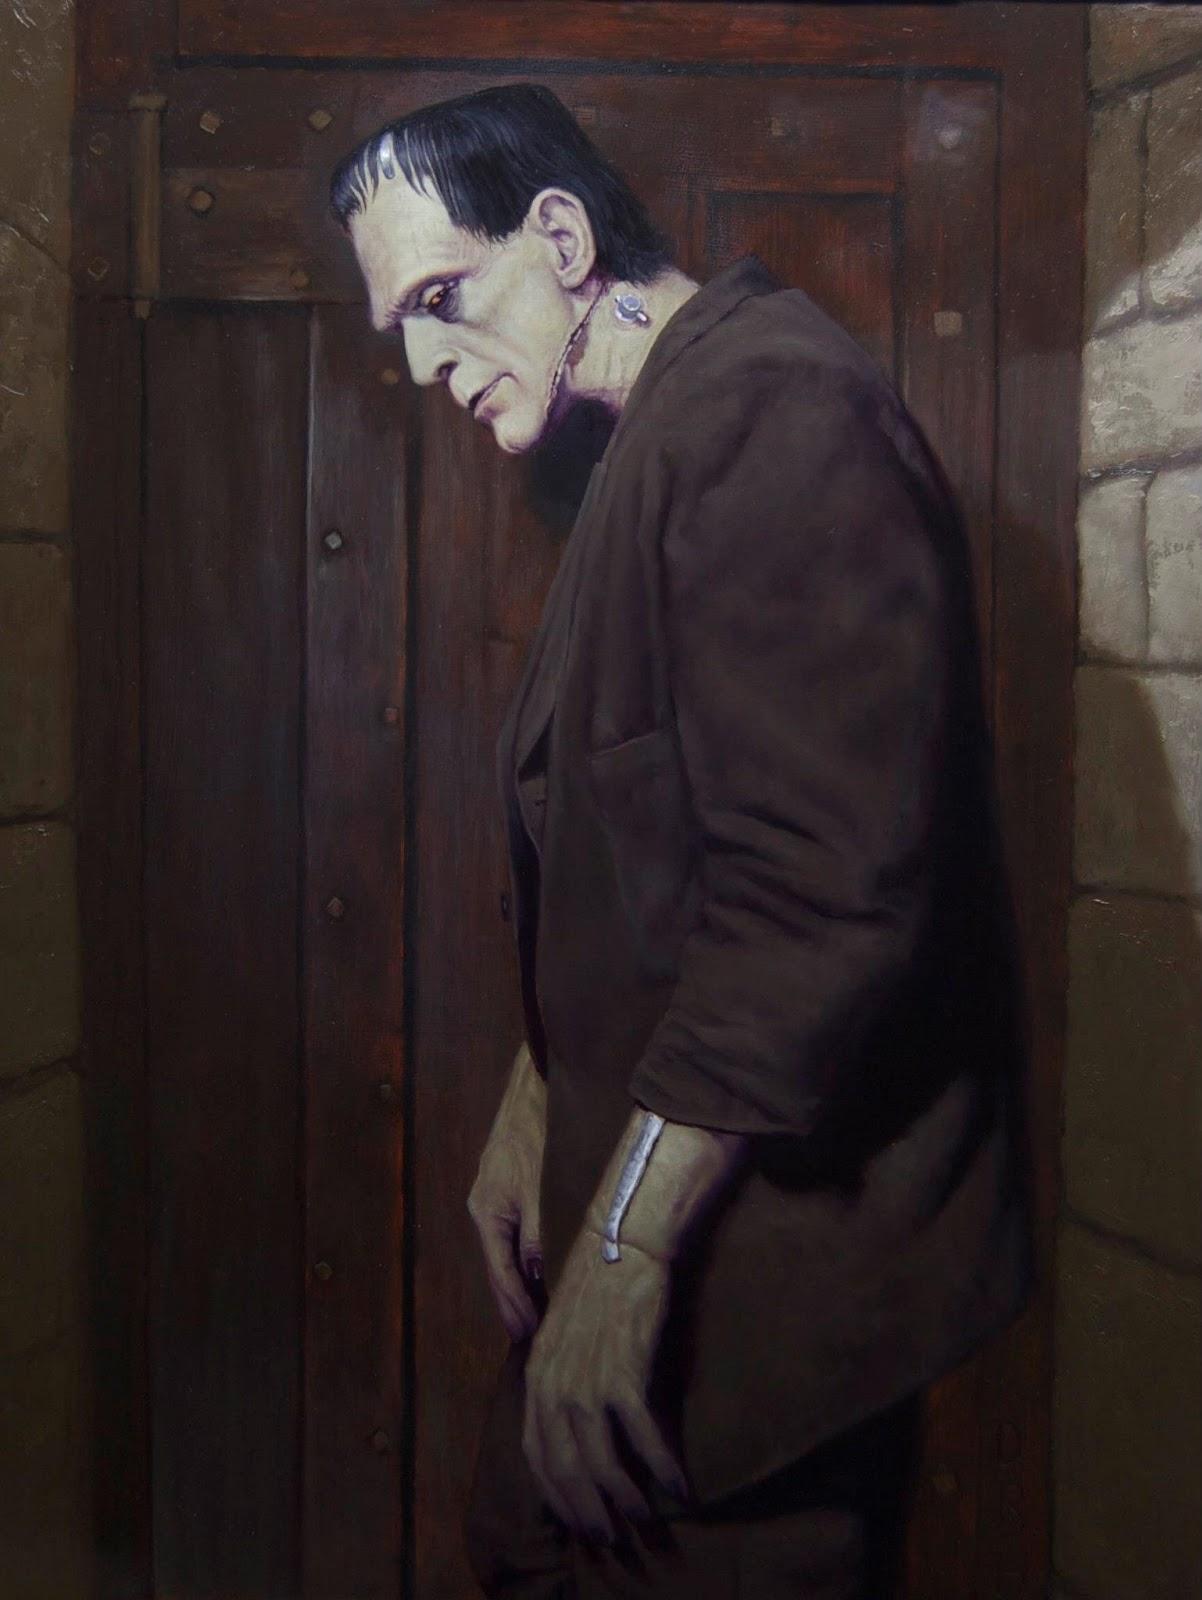 northrop frye frankenstein Frankenstein essays - mary shelley's frankenstein and structuralism barthes clearly drew influence from northrop frye, author of 'anatomy of criticism'.